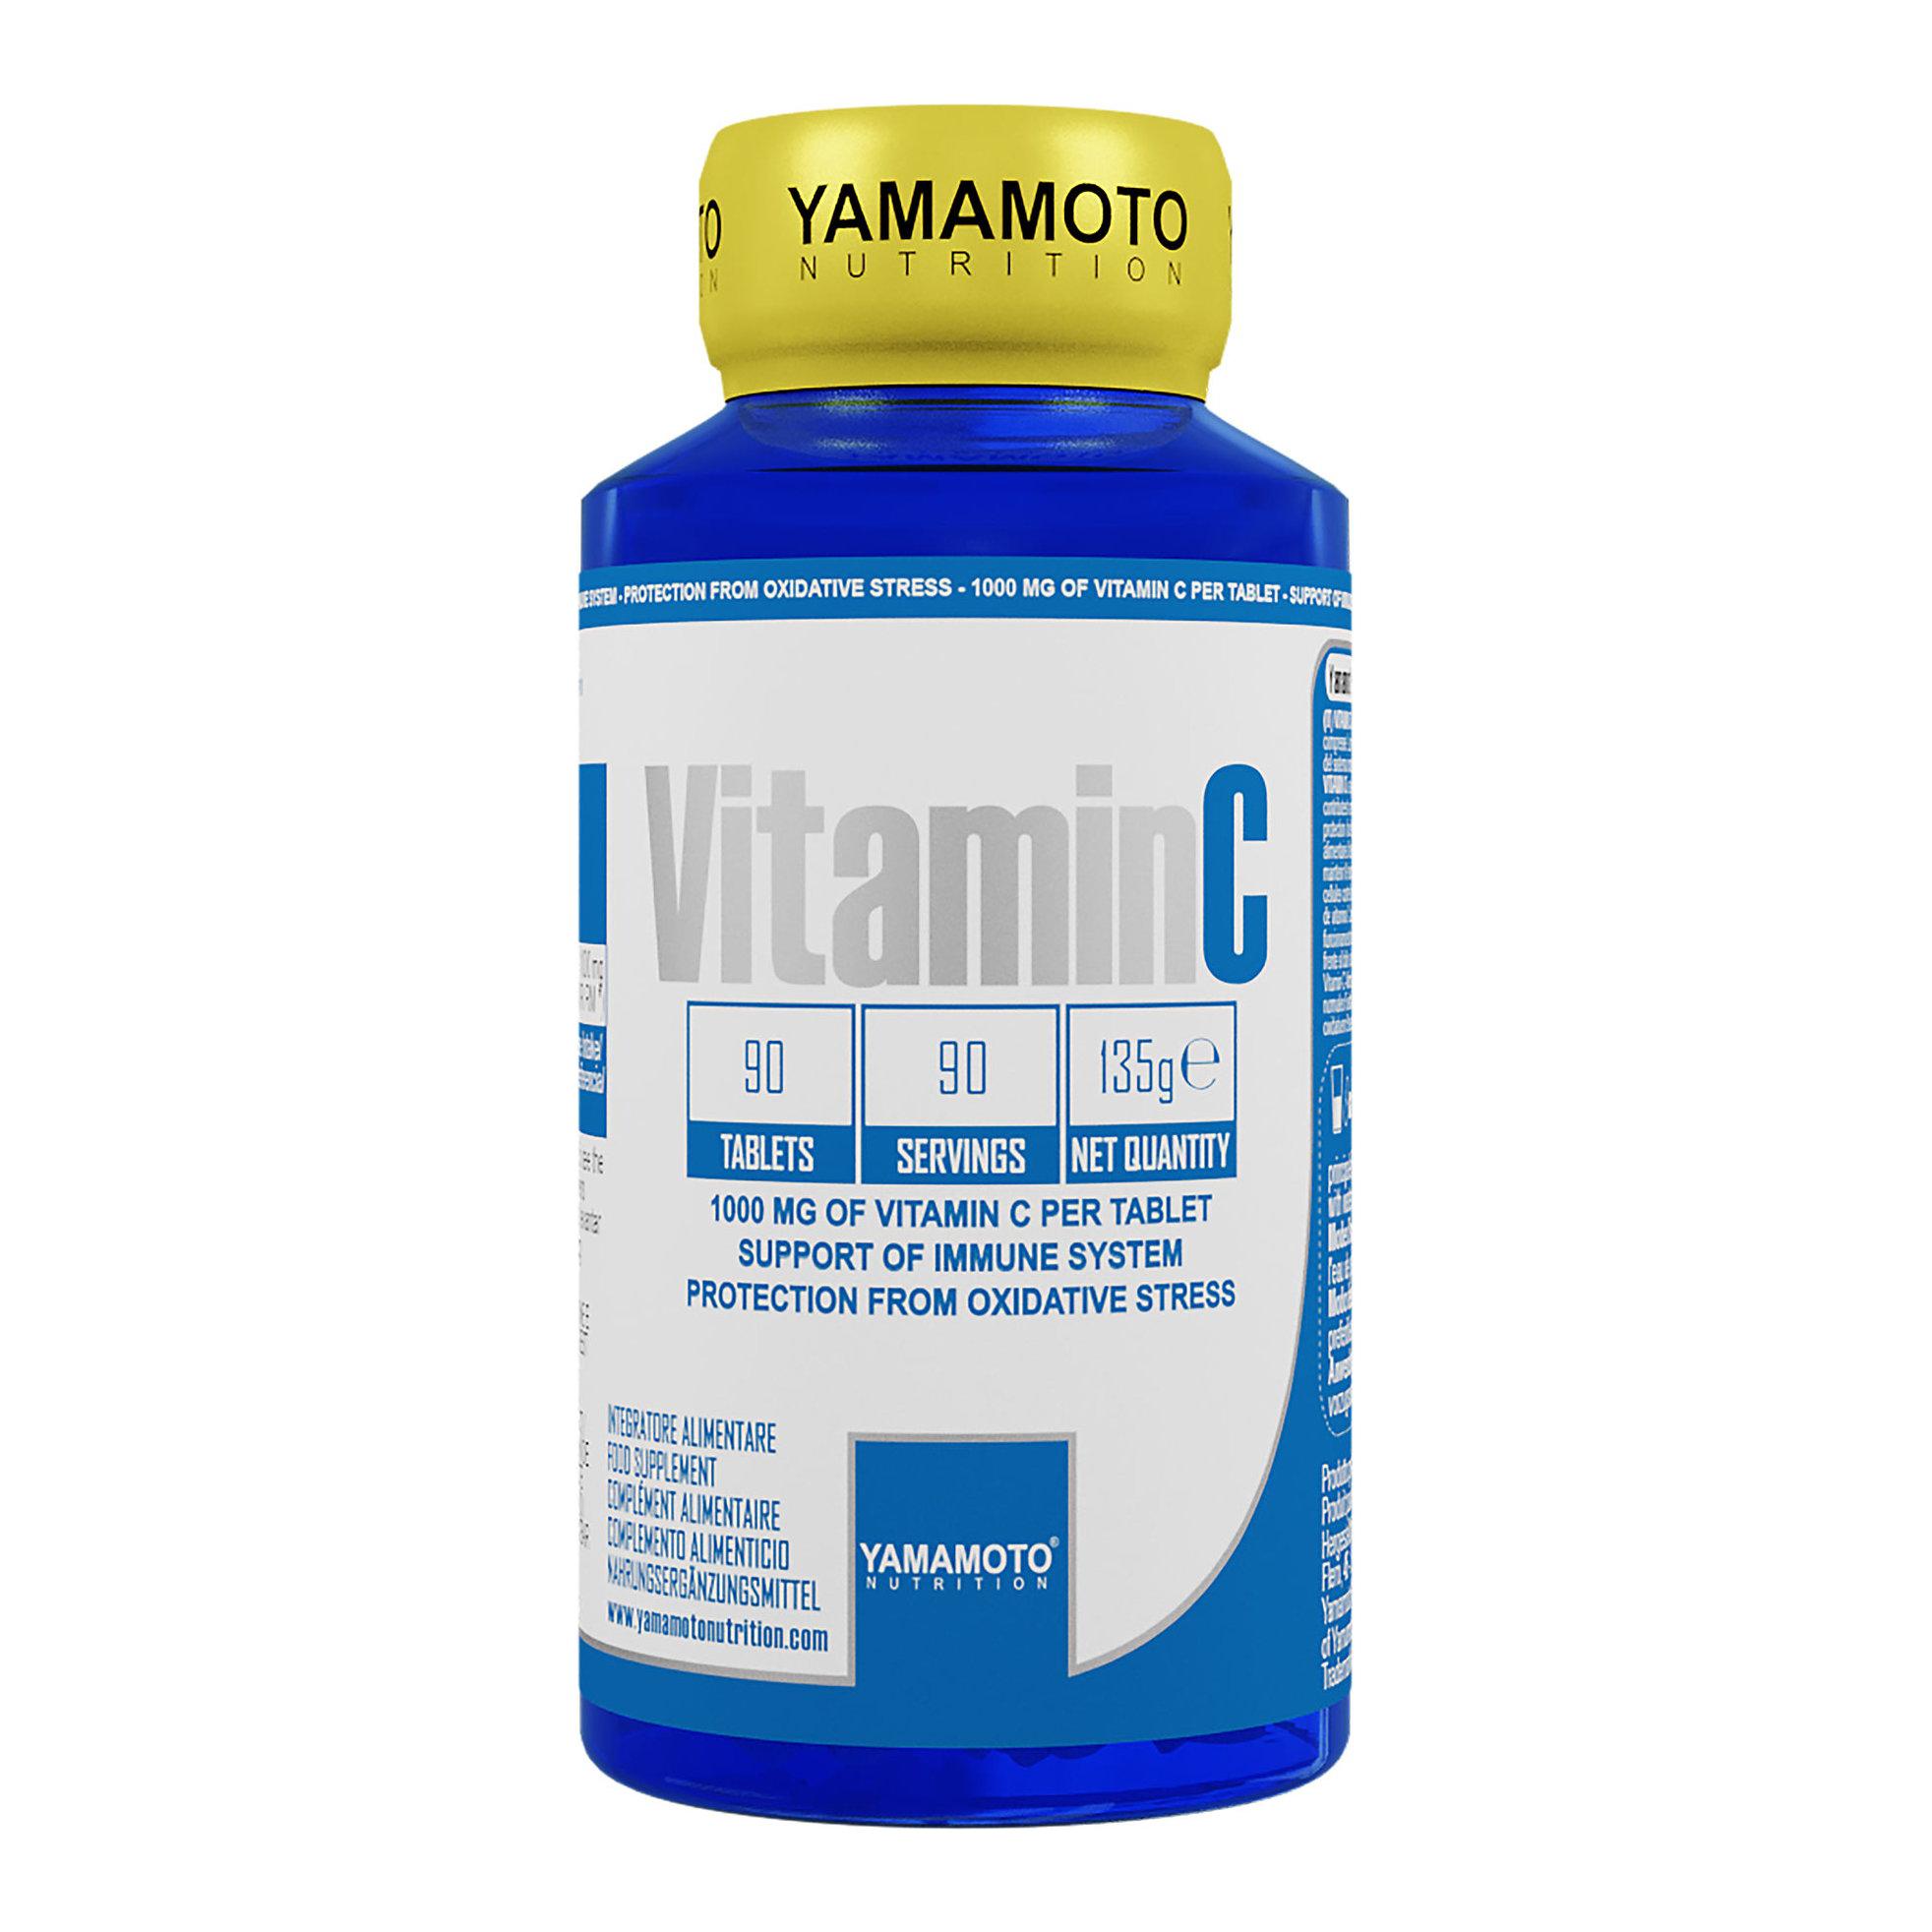 Yamamoto Vitamin C 90 tab.